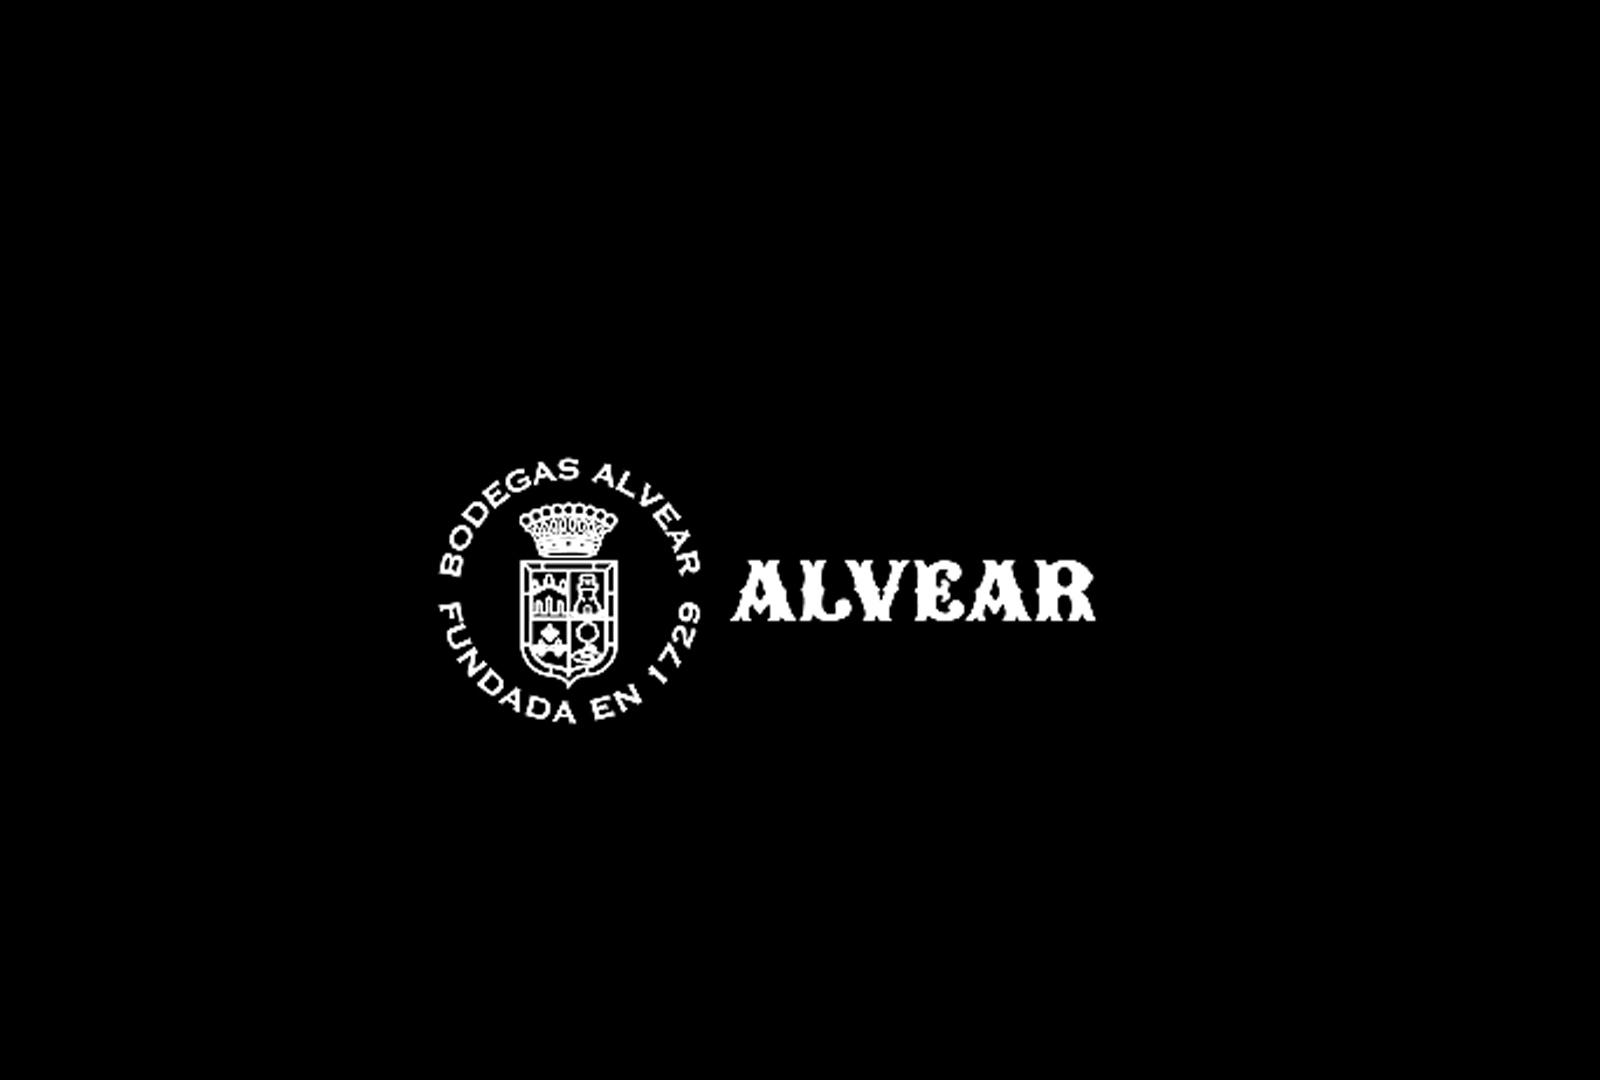 Alvear PX Solera 1927. Un clásico de la bodega.